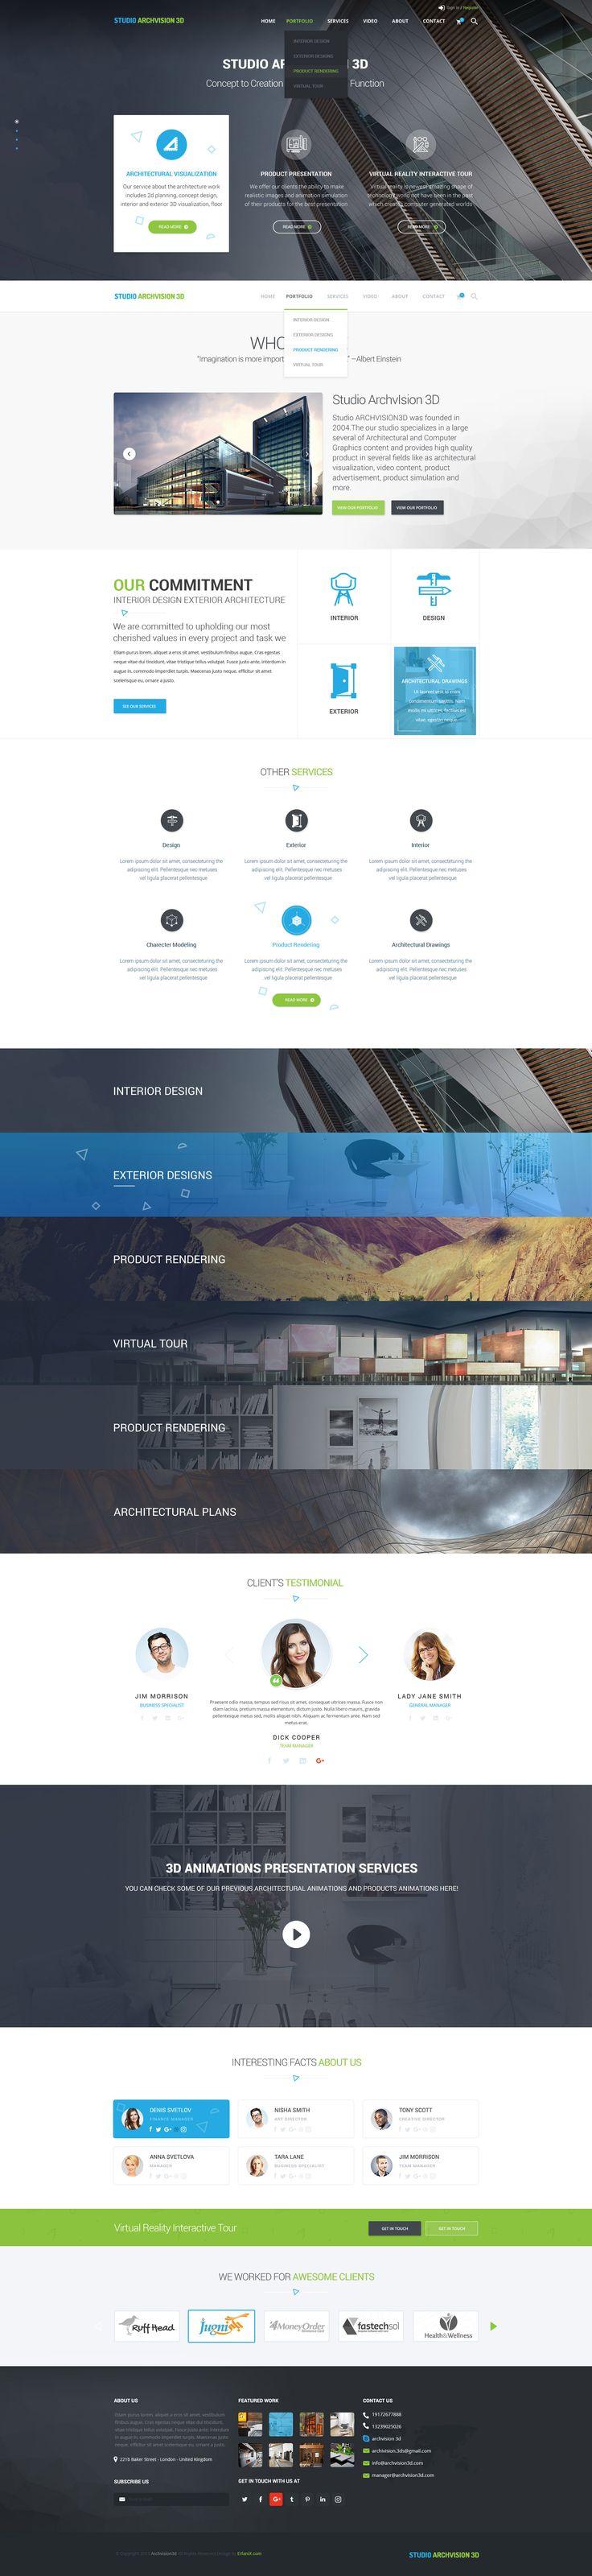 Archvision3d main page